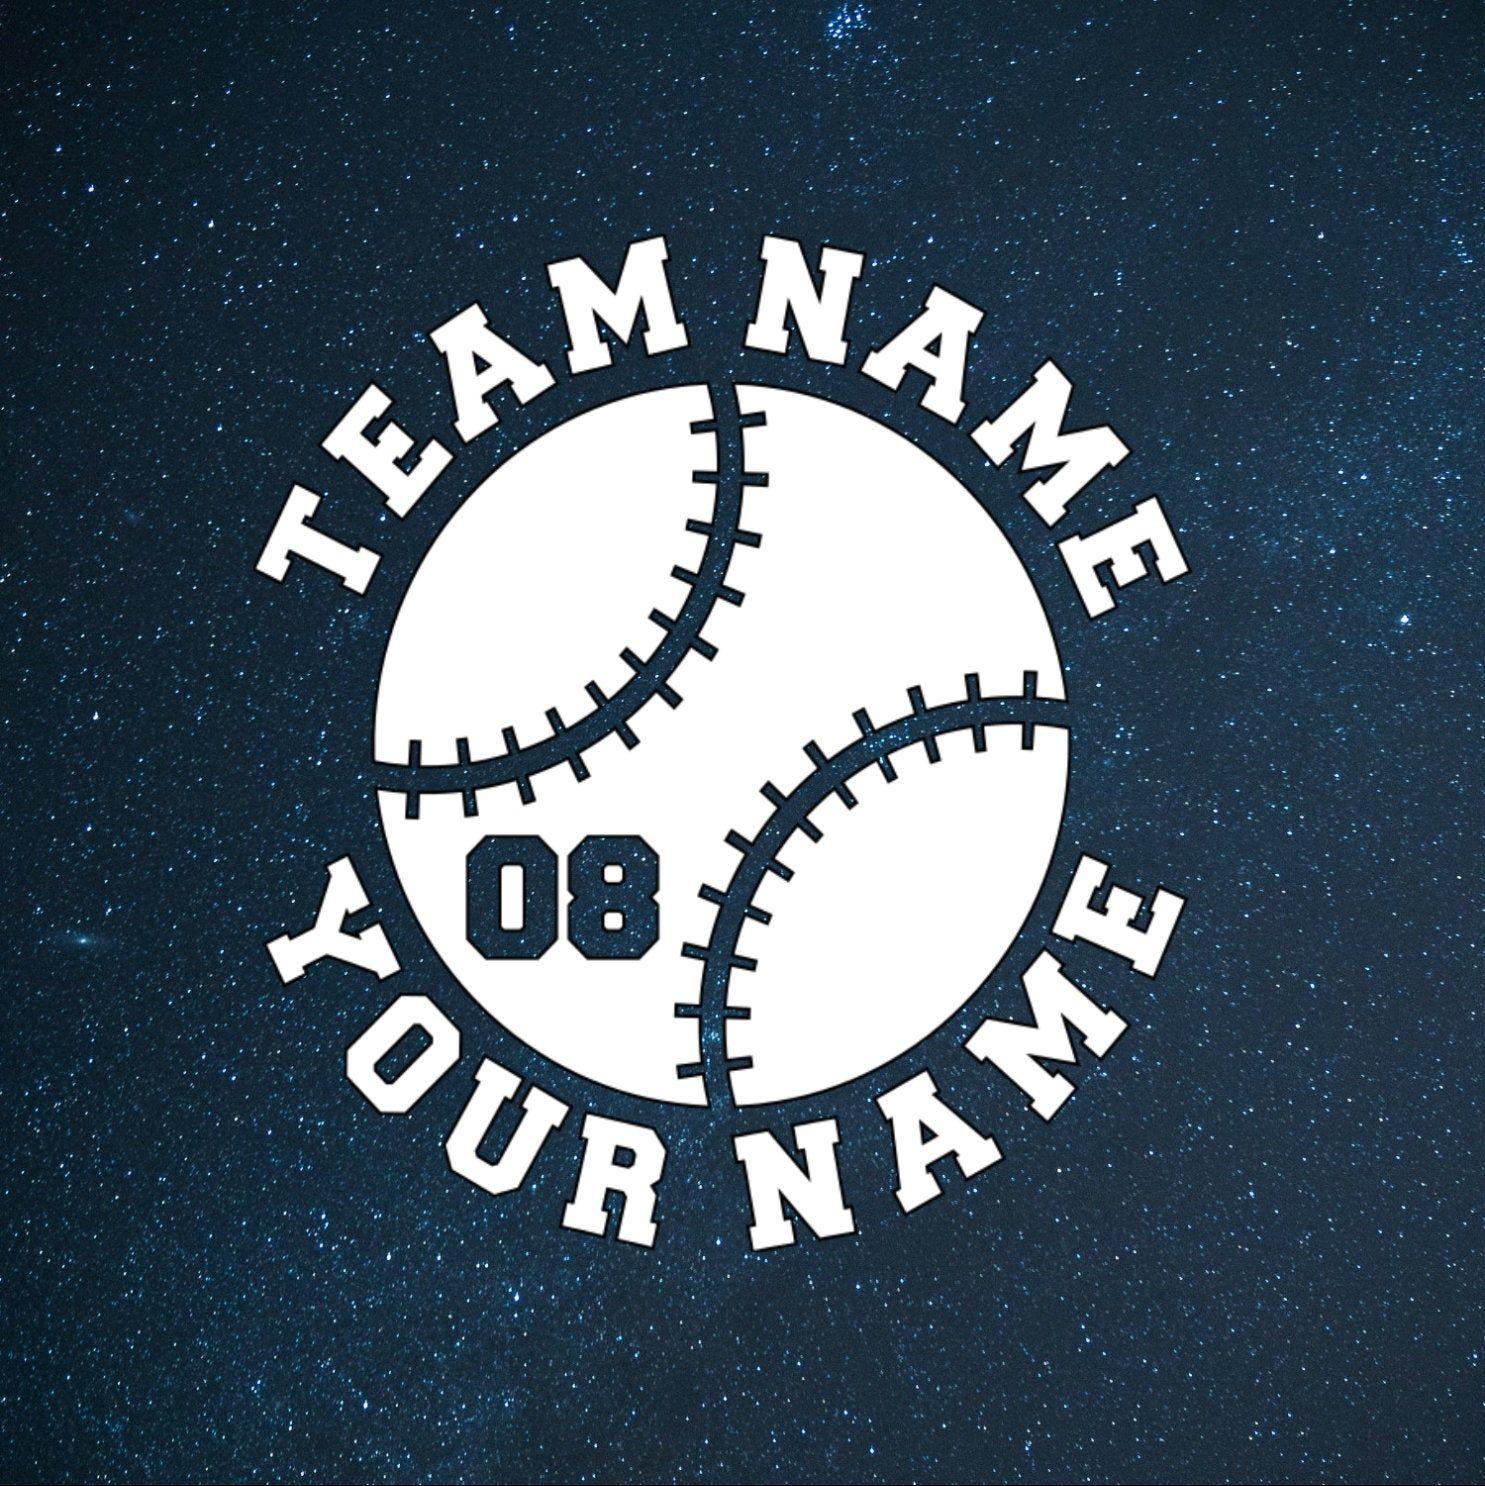 Personalized baseball decal baseball sticker sports decal